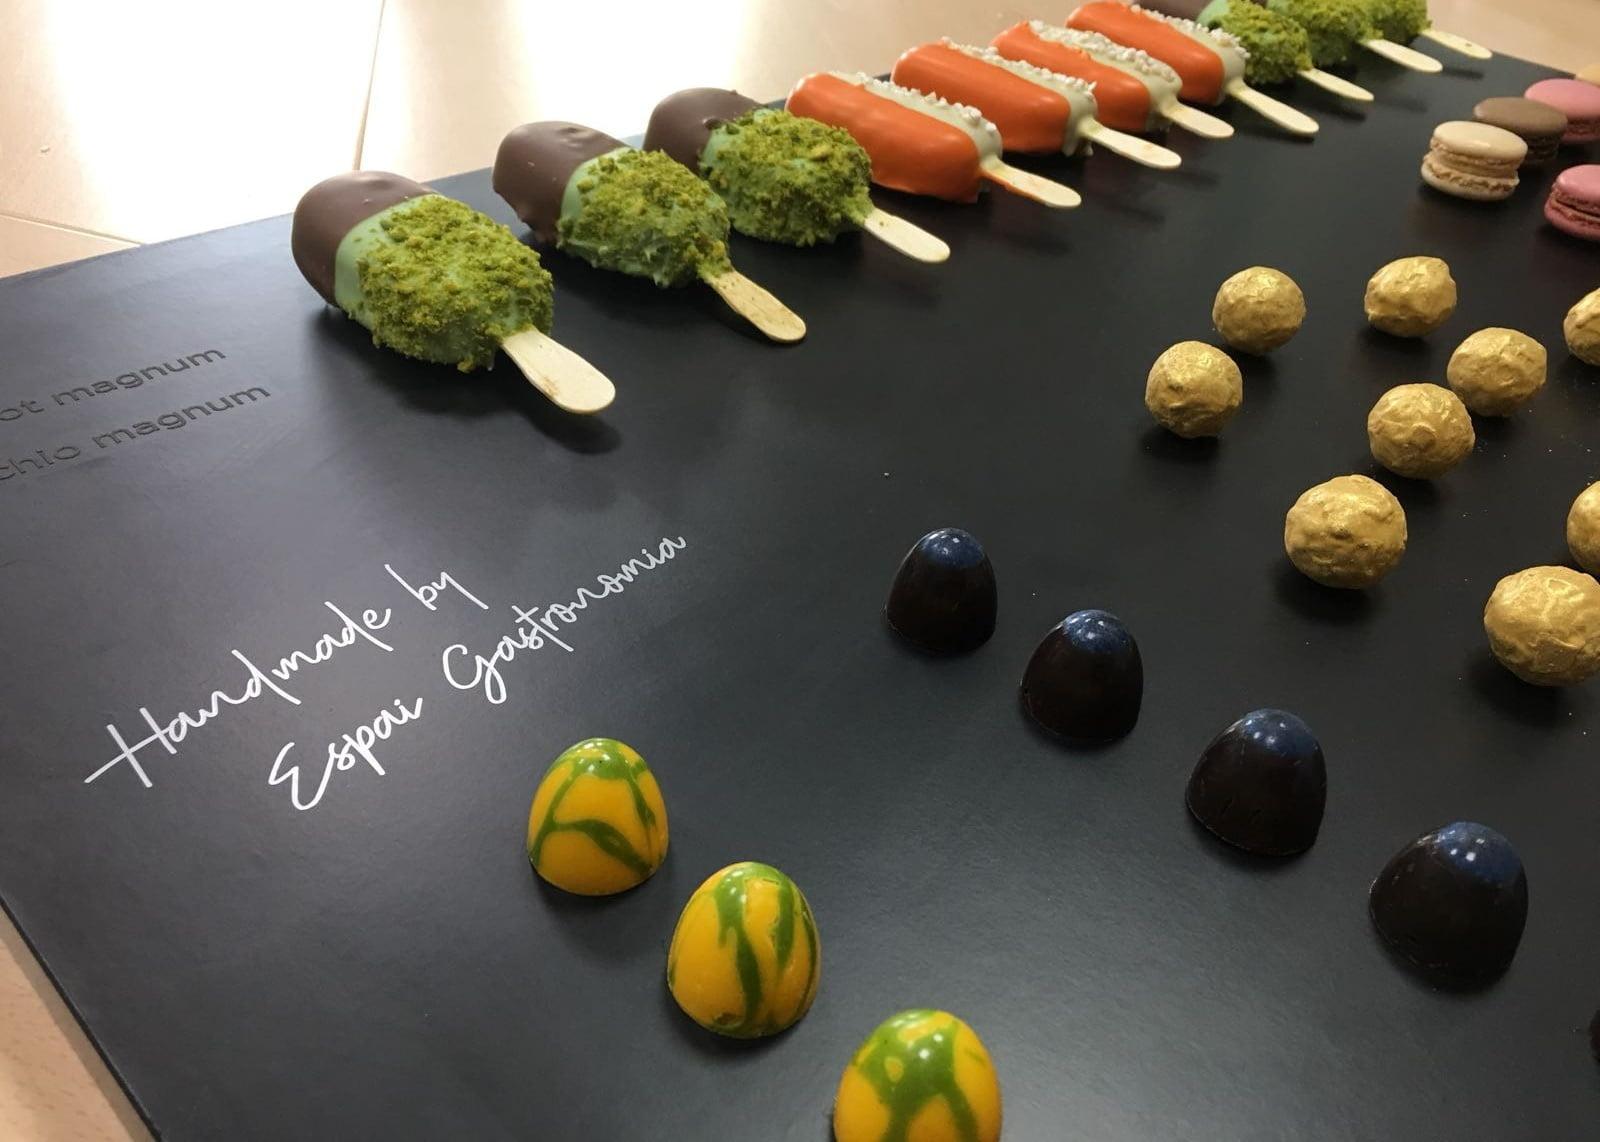 Buffet-dolc-espai-gastronomia2-01